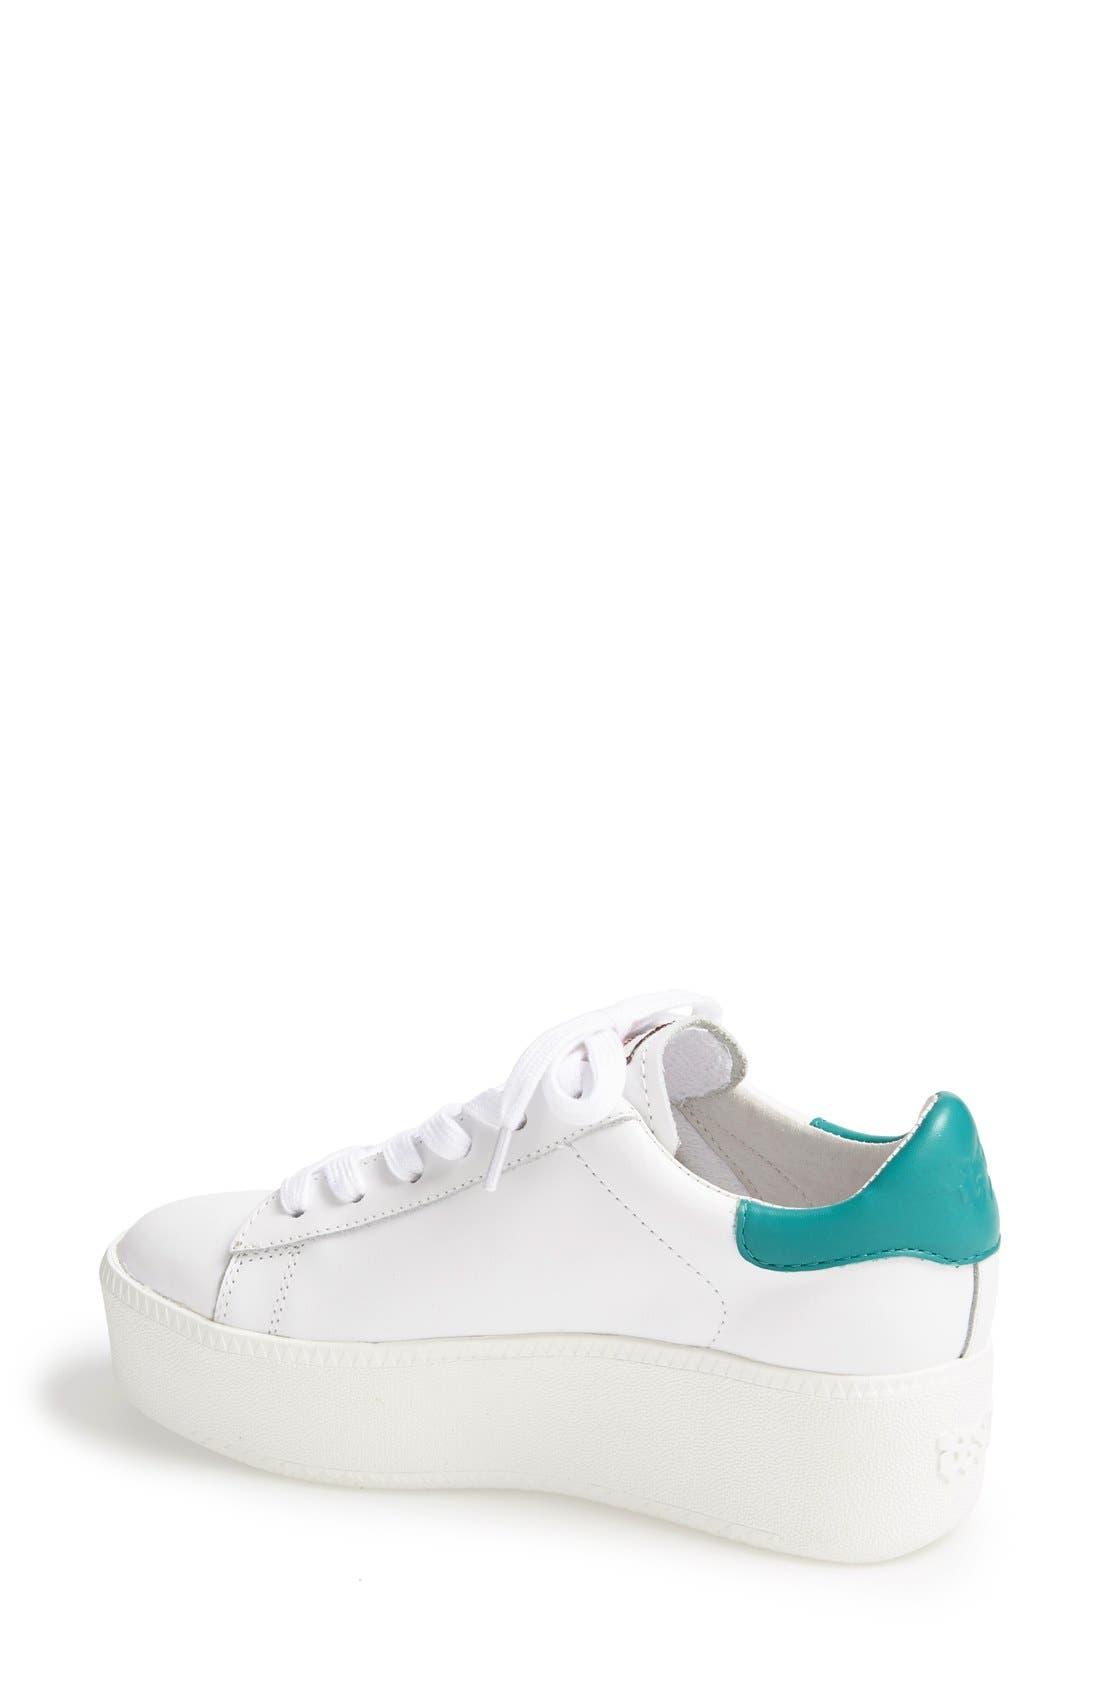 Alternate Image 2  - Ash 'Cult' Platform Sneaker (Women)